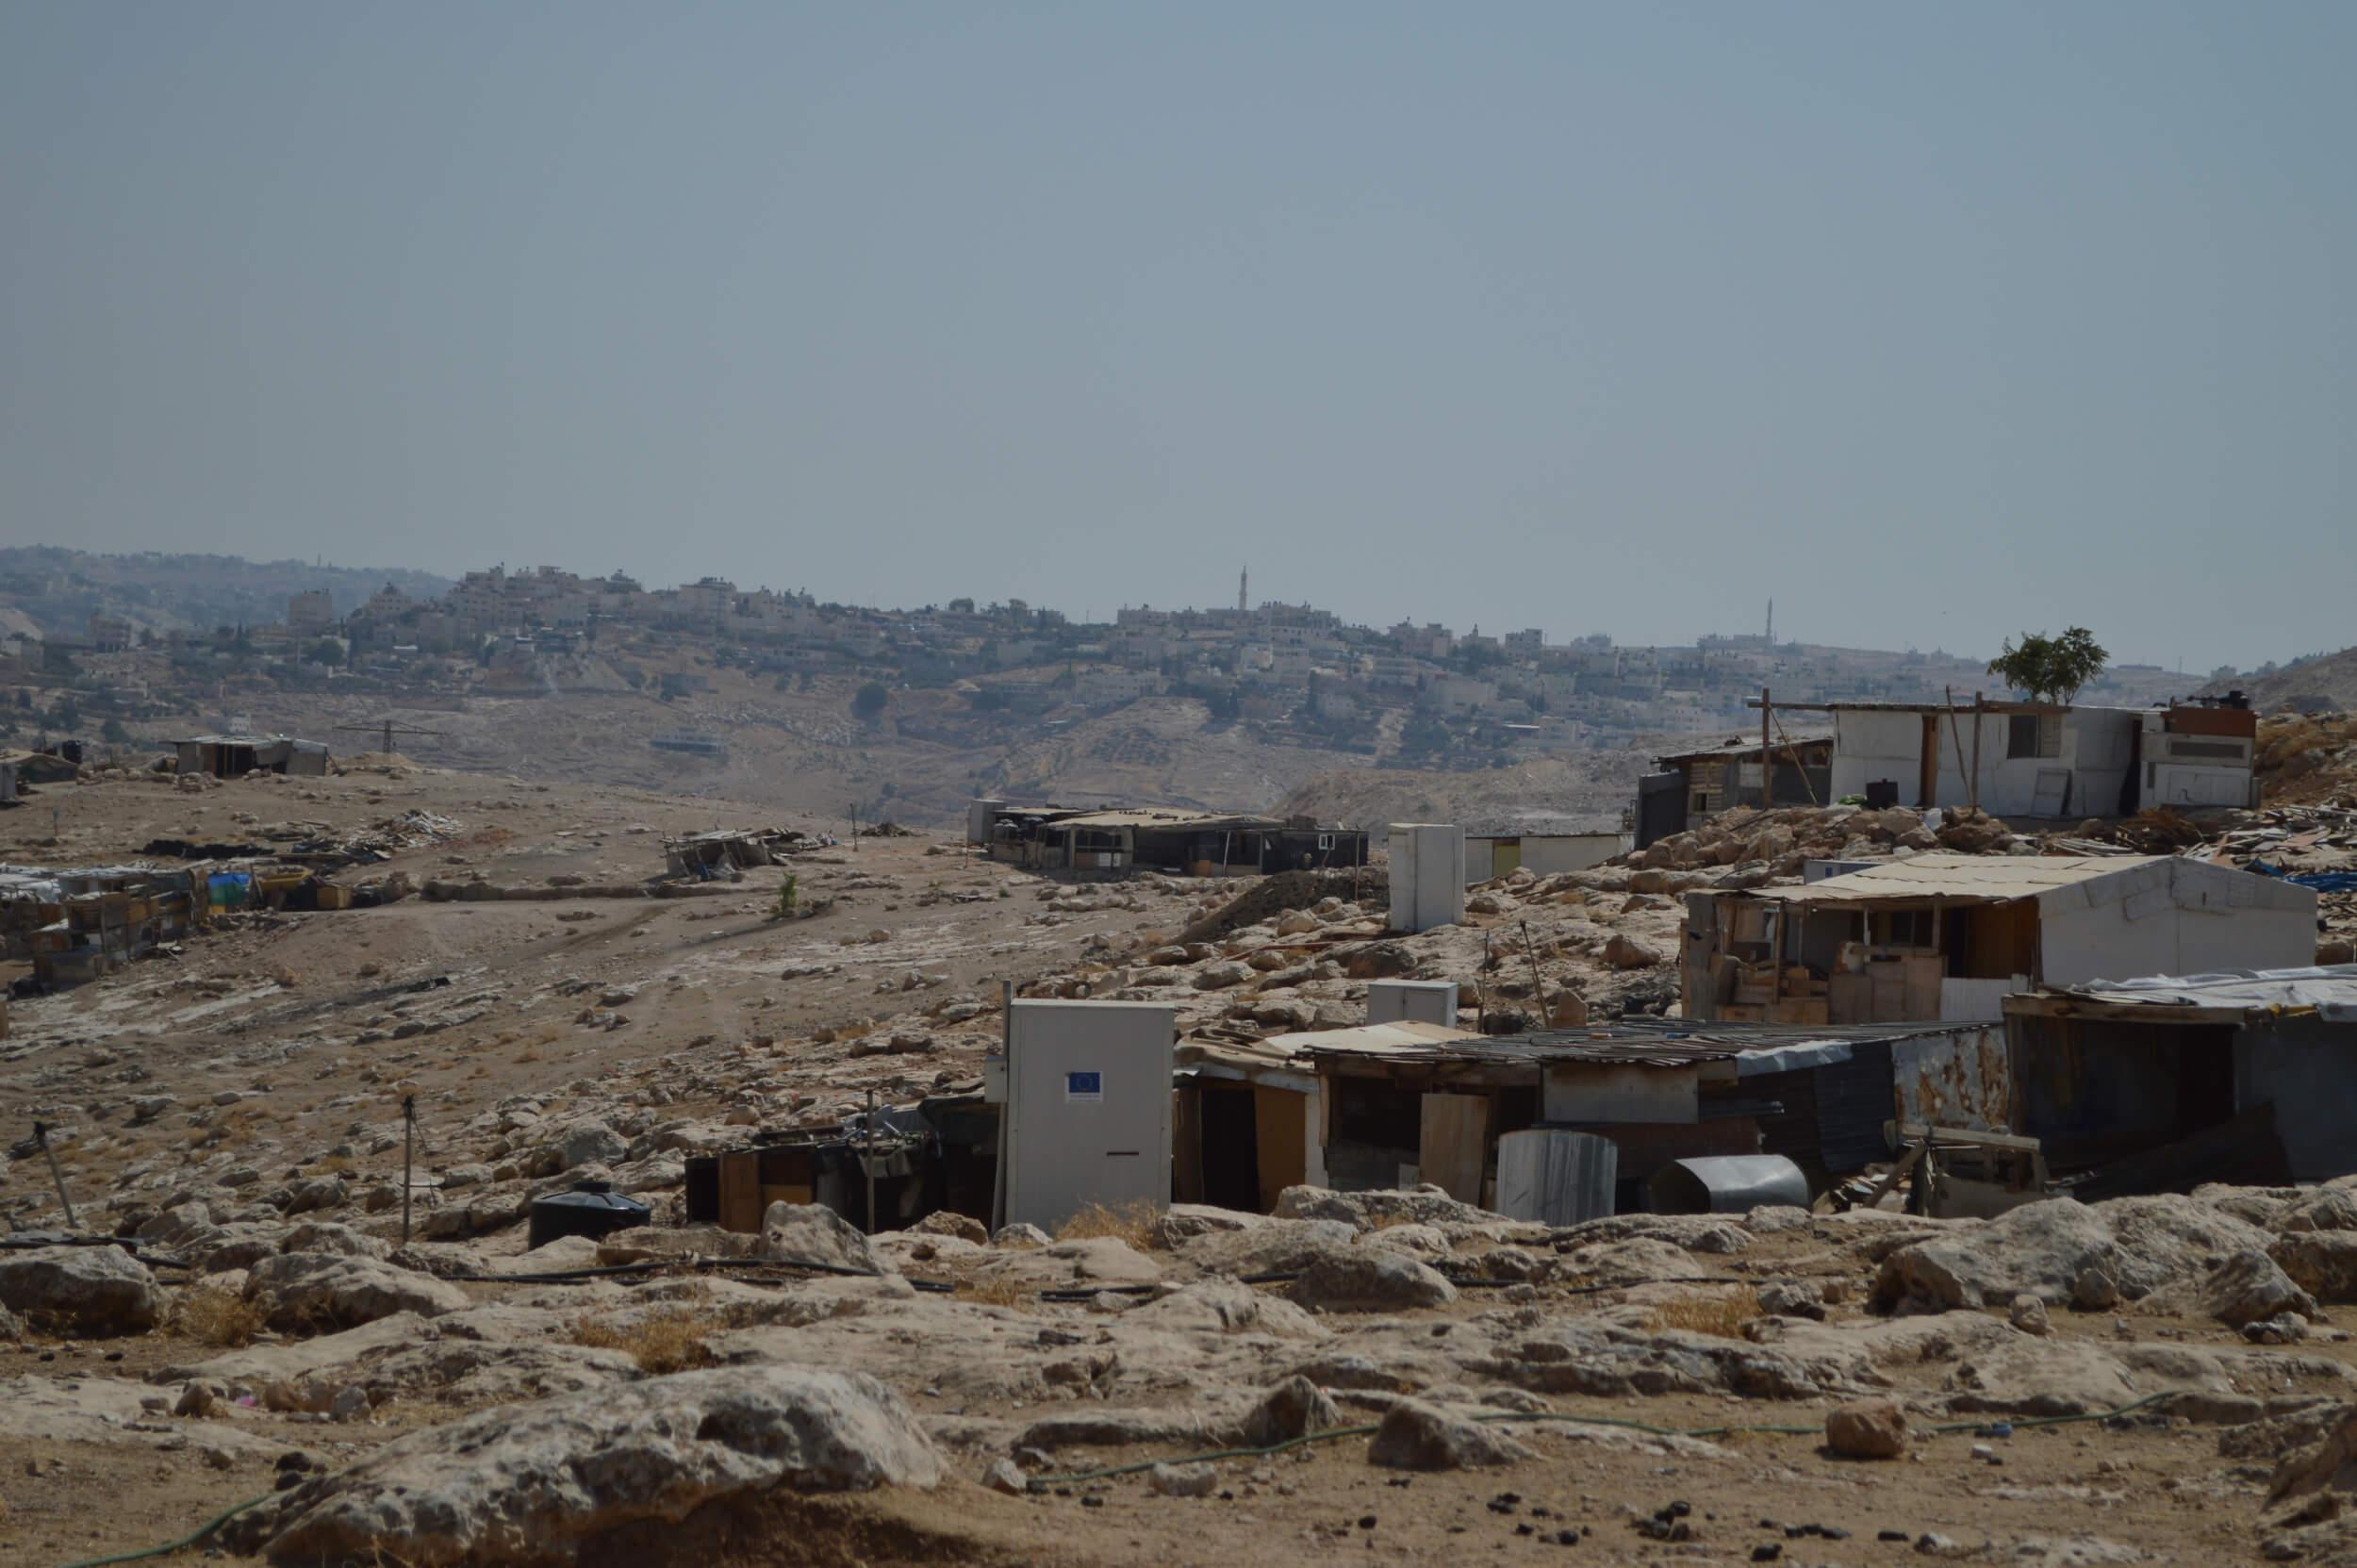 Abu Nuwwar in the foreground and Ezariya and al-Jabal in the background. (Photo: Lydia Noon)